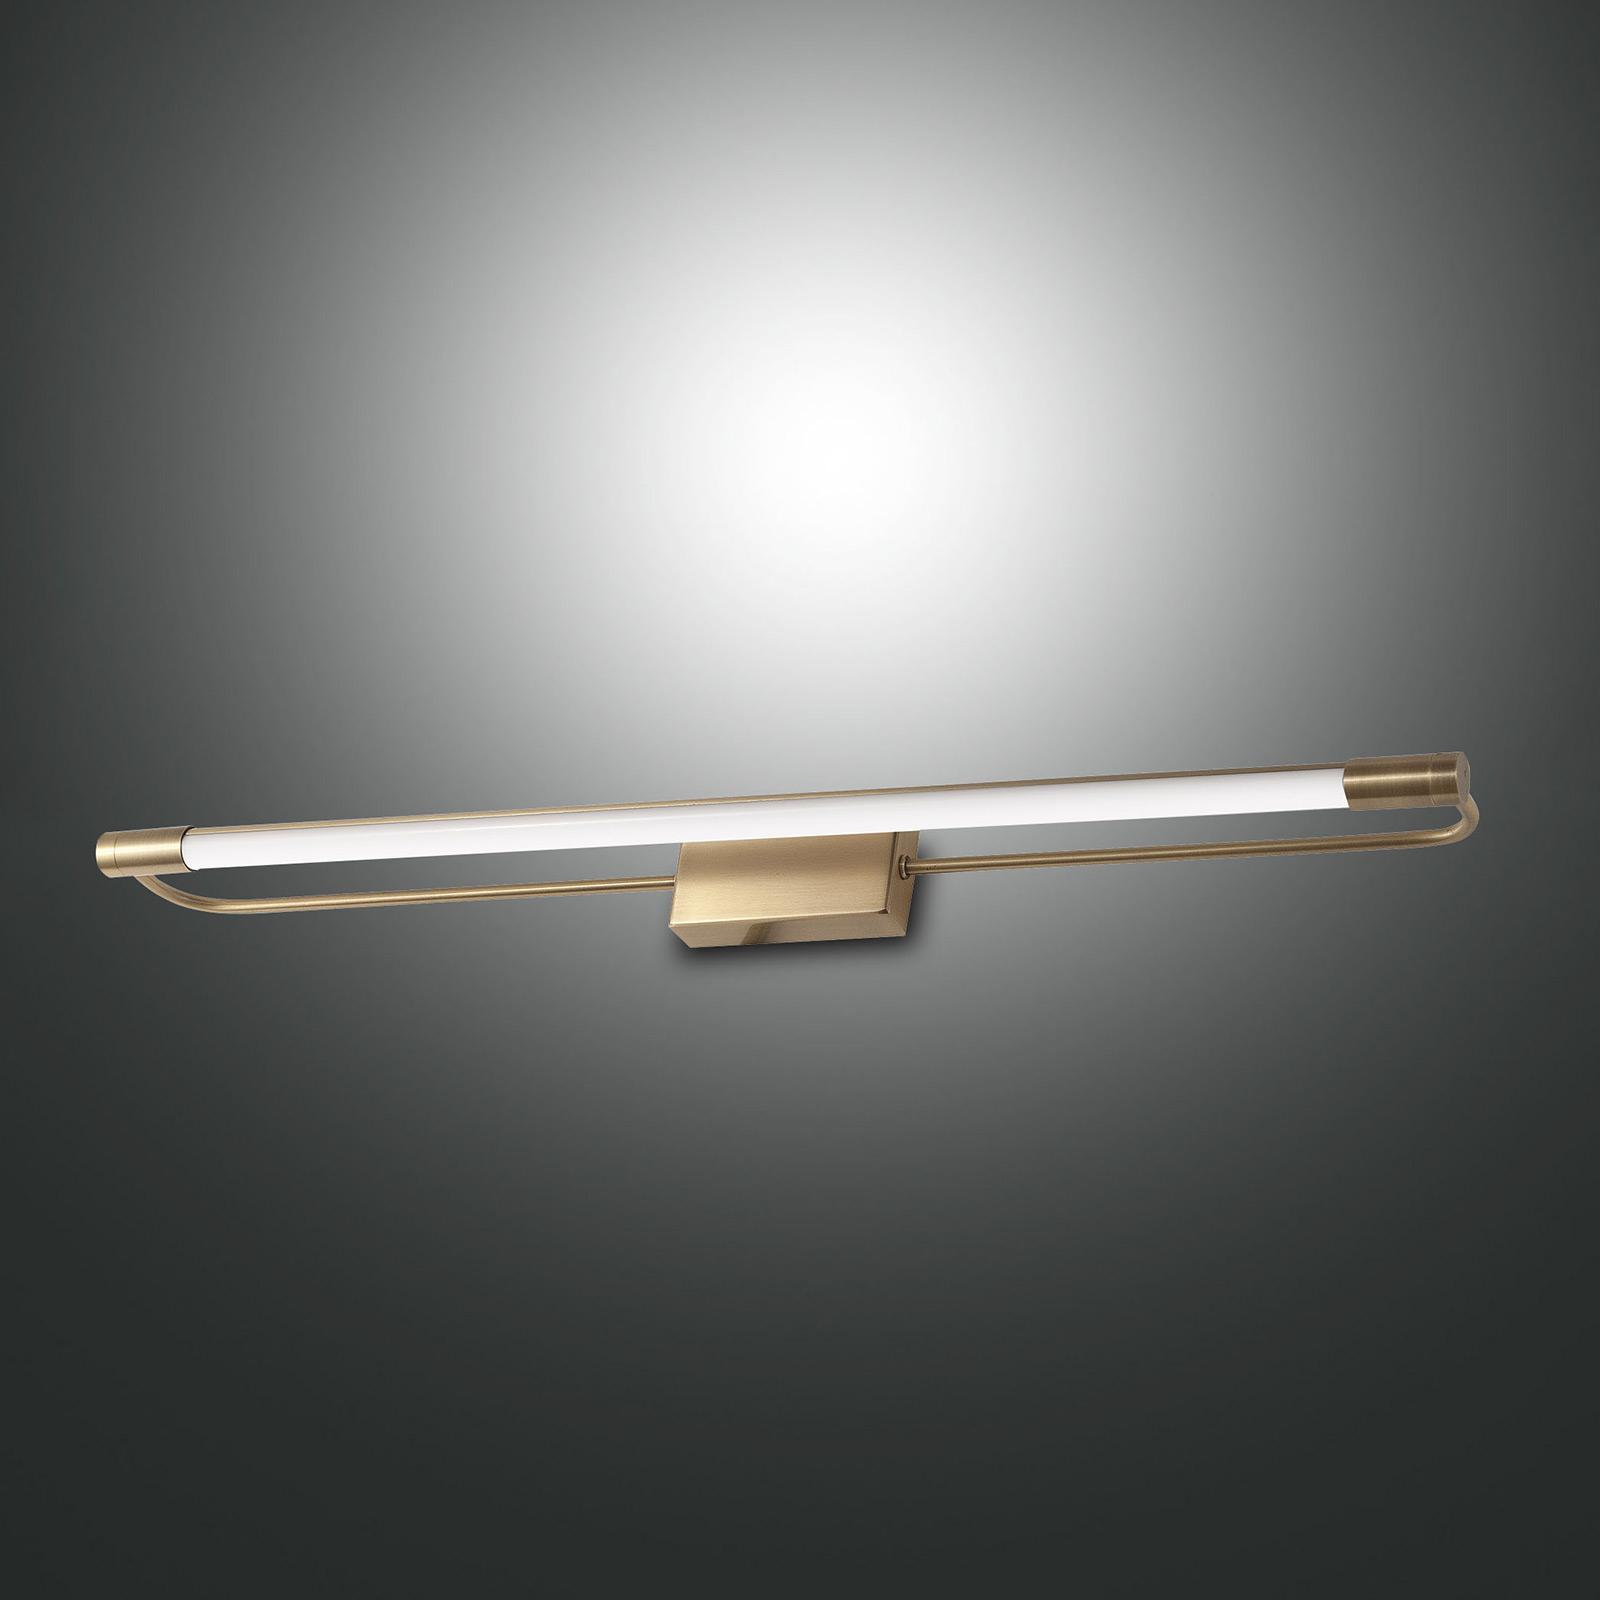 Applique LED Rapallo, ottone, IP44, 60 cm